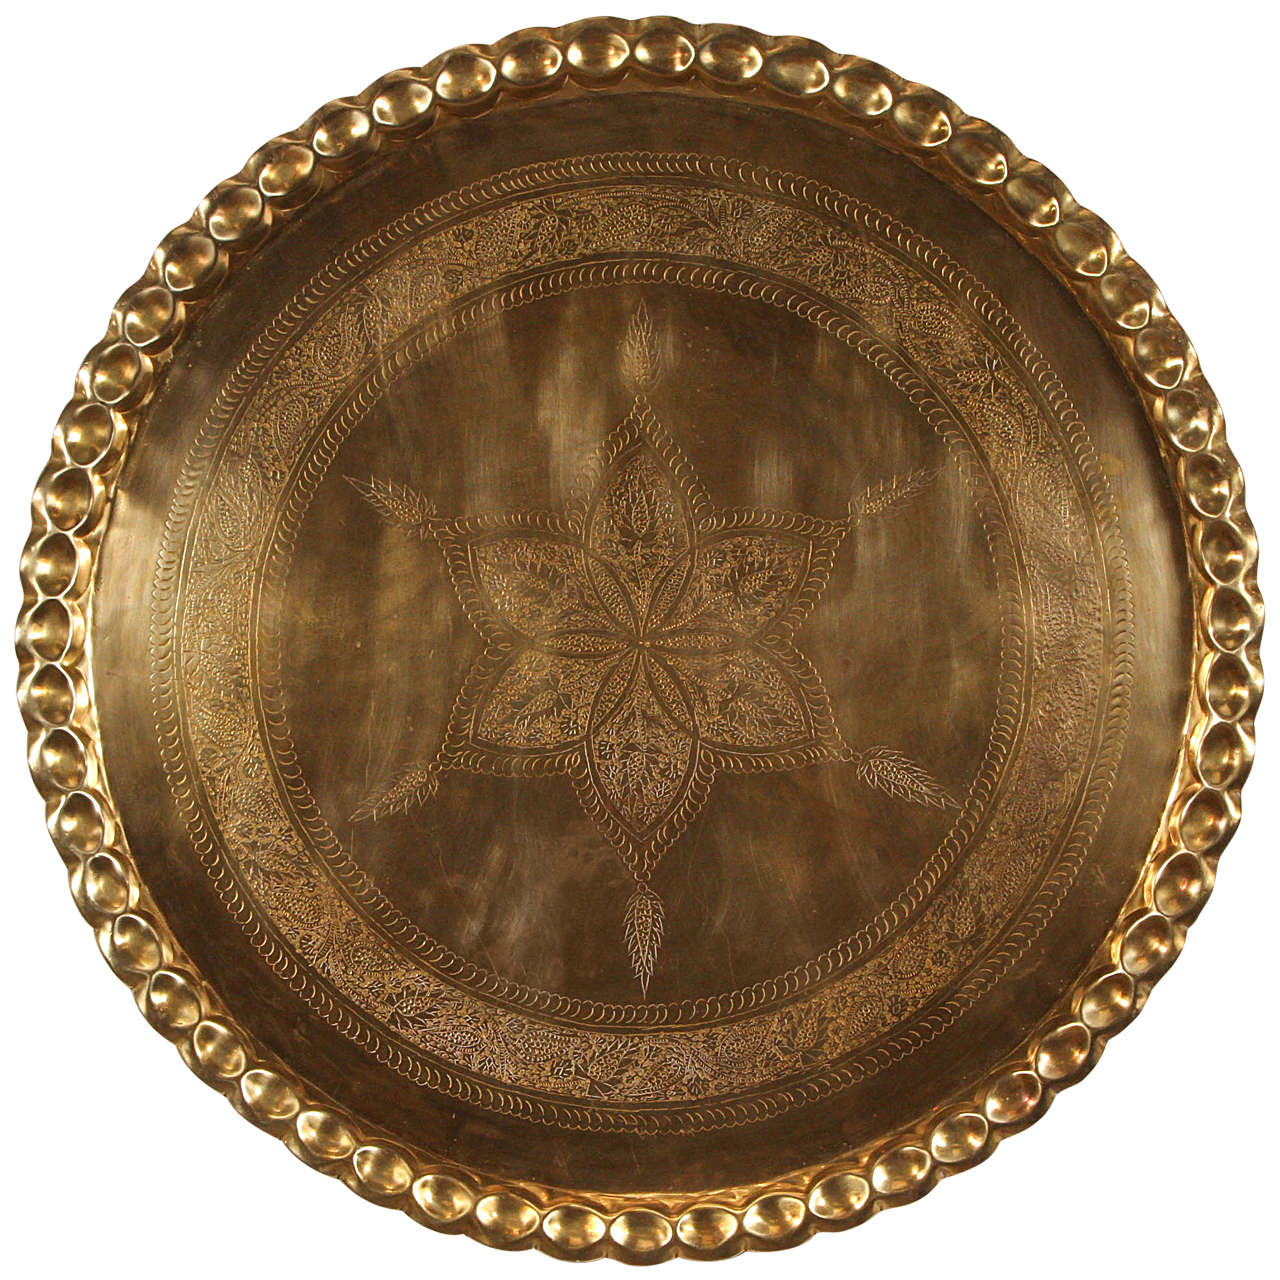 Large Hanging Moroccan Brass Tray Platter At 1stdibs